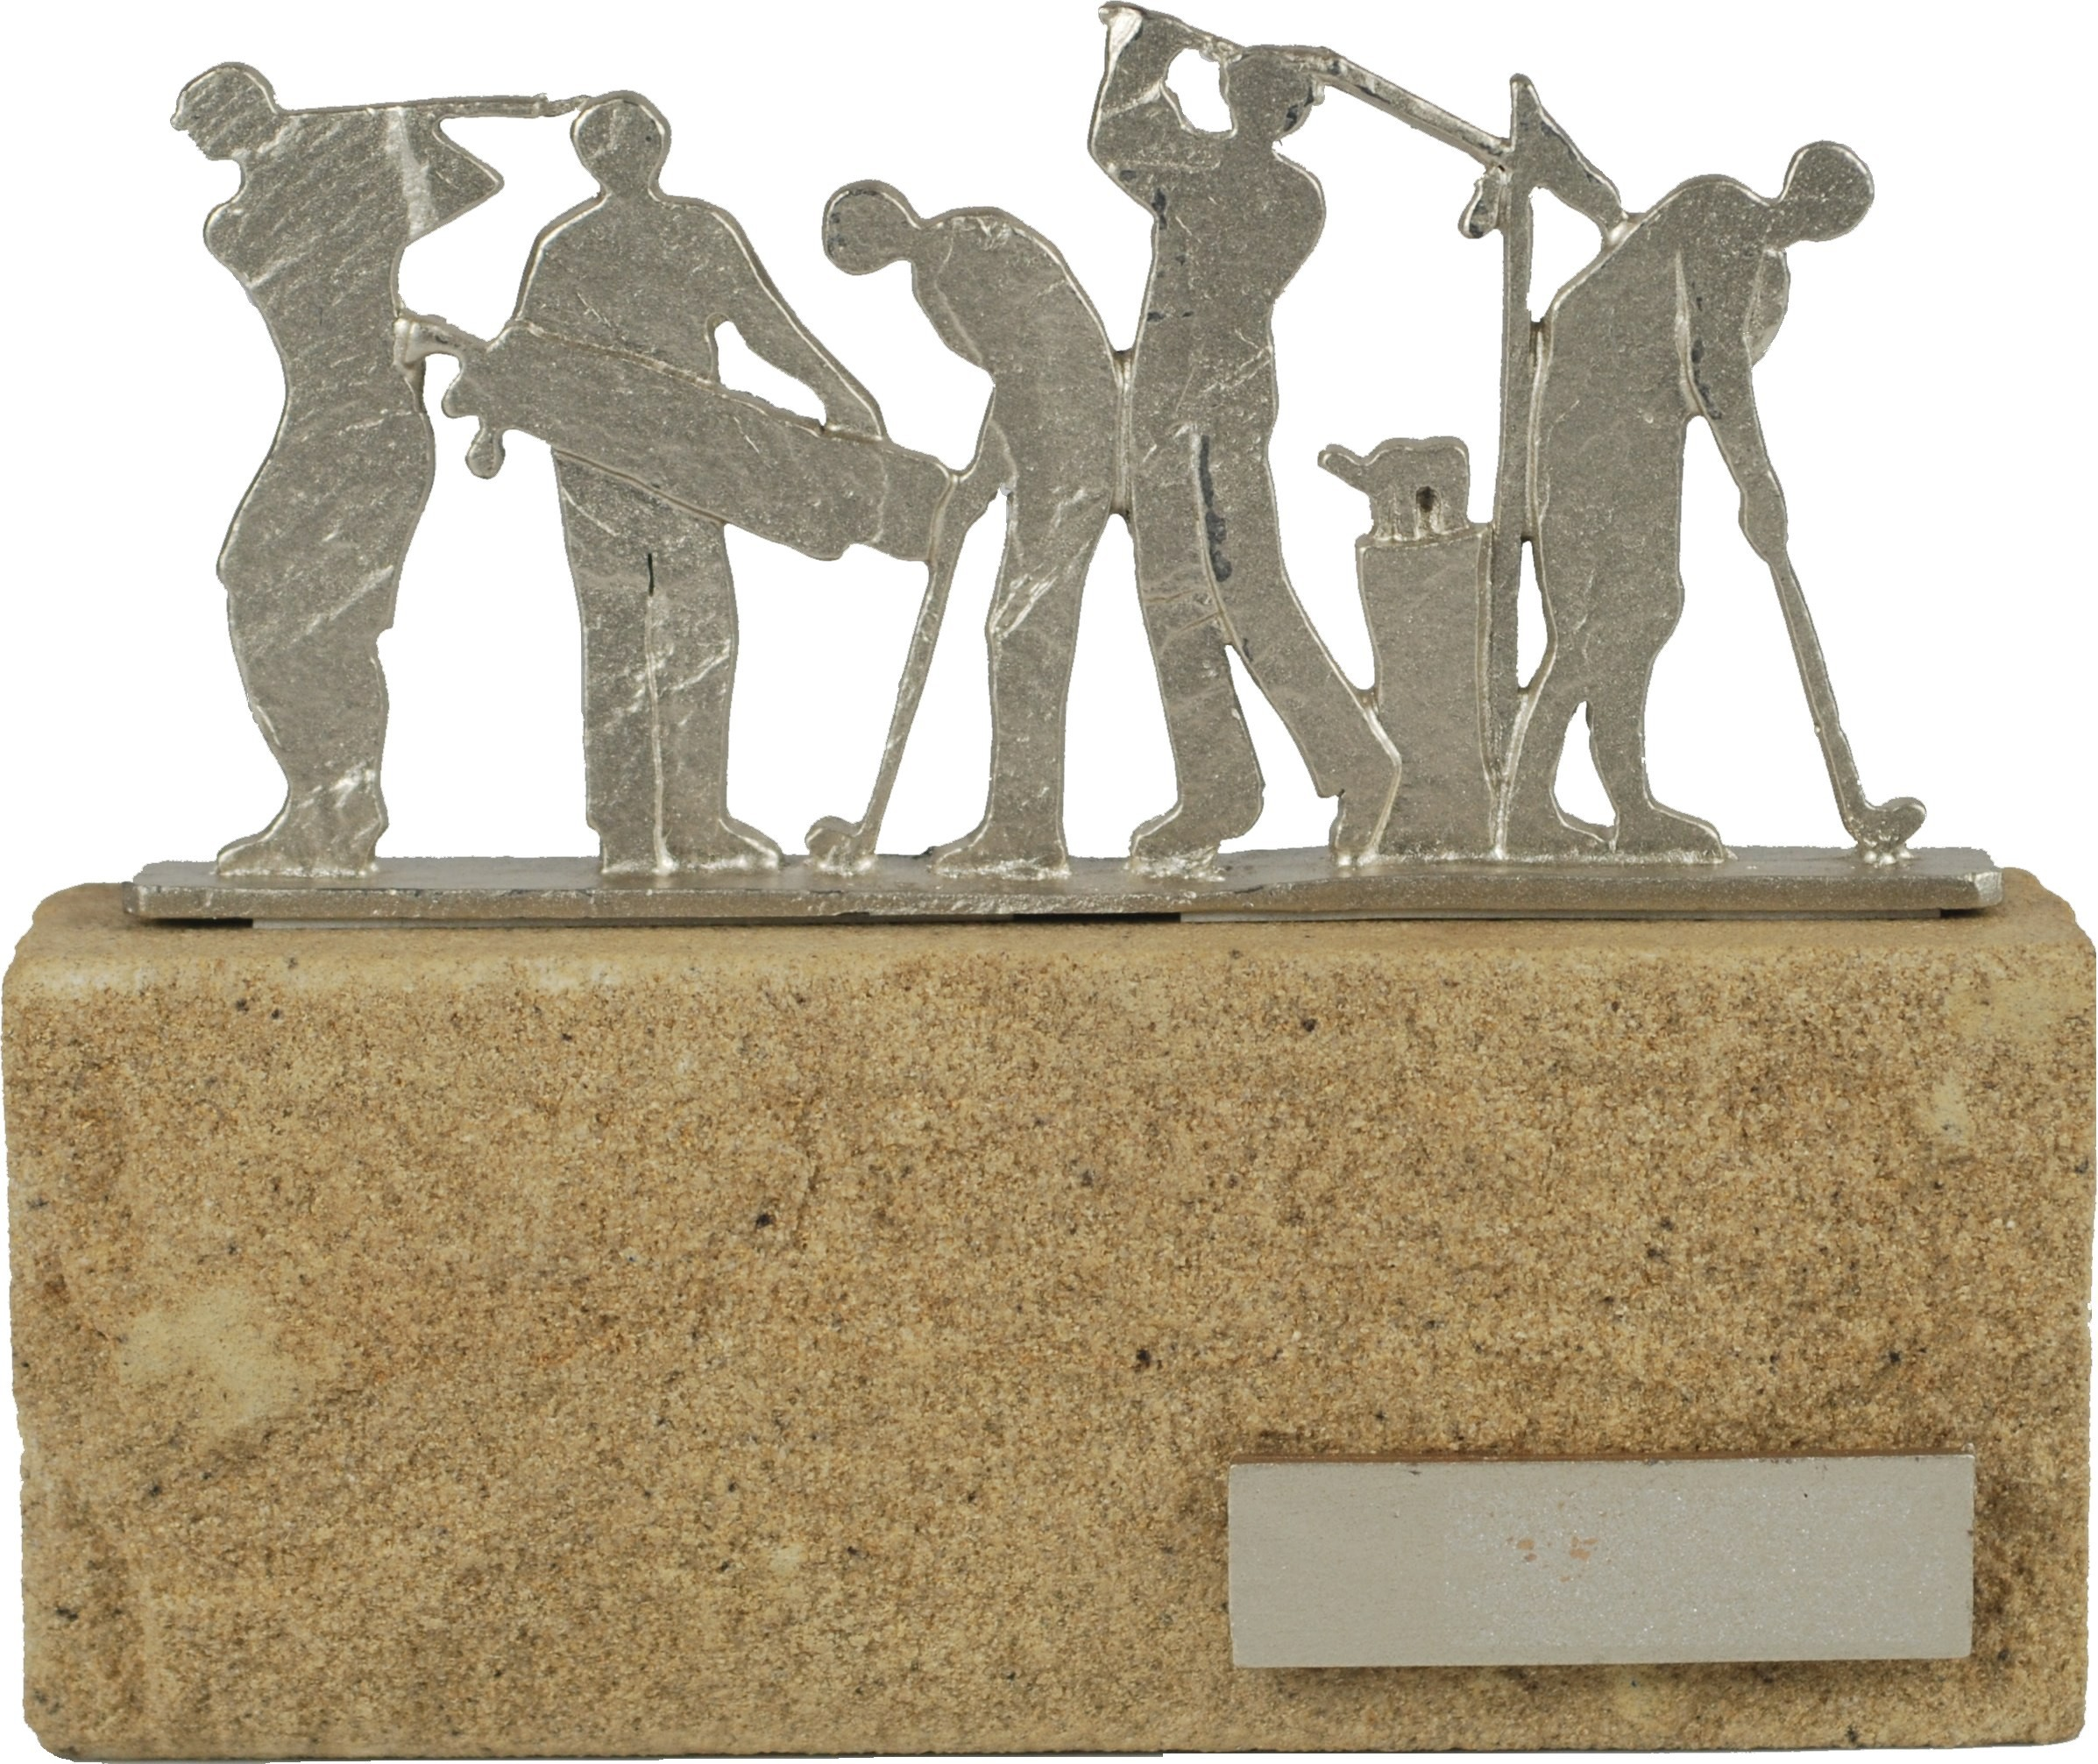 Luxe trofee golfers / golfen 17cm WBEL 604